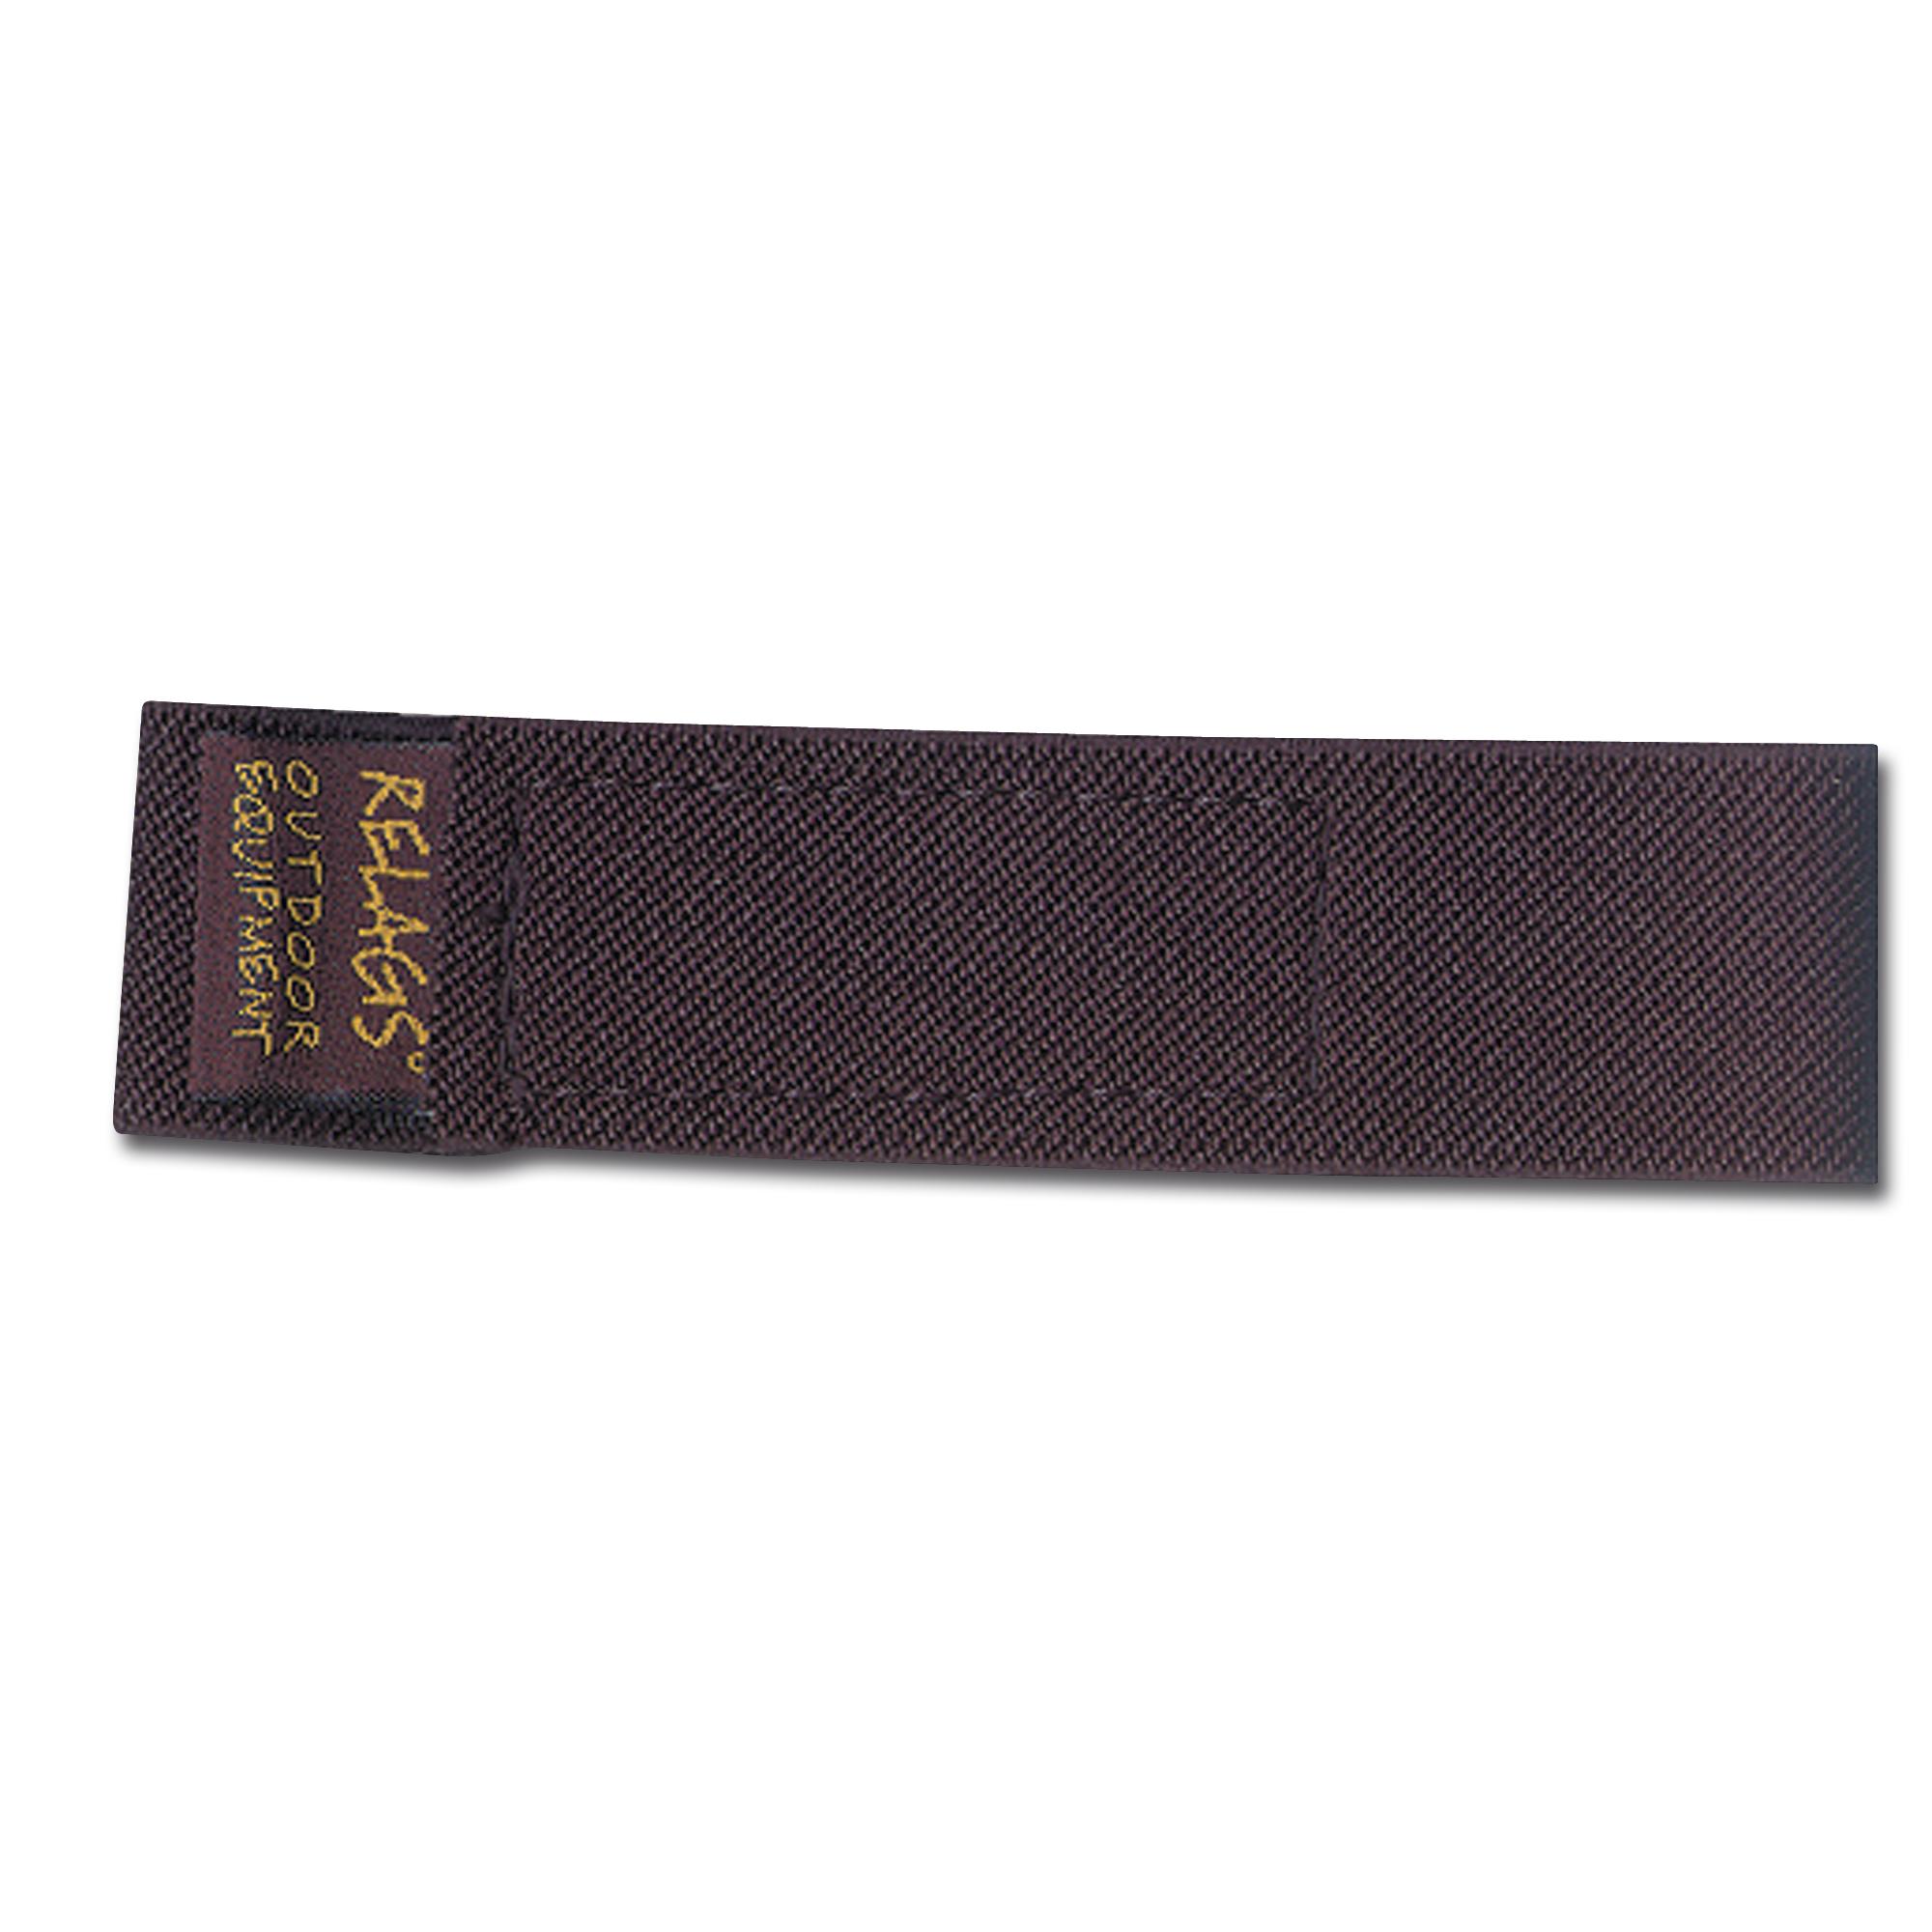 Strapits schwarz 30 cm